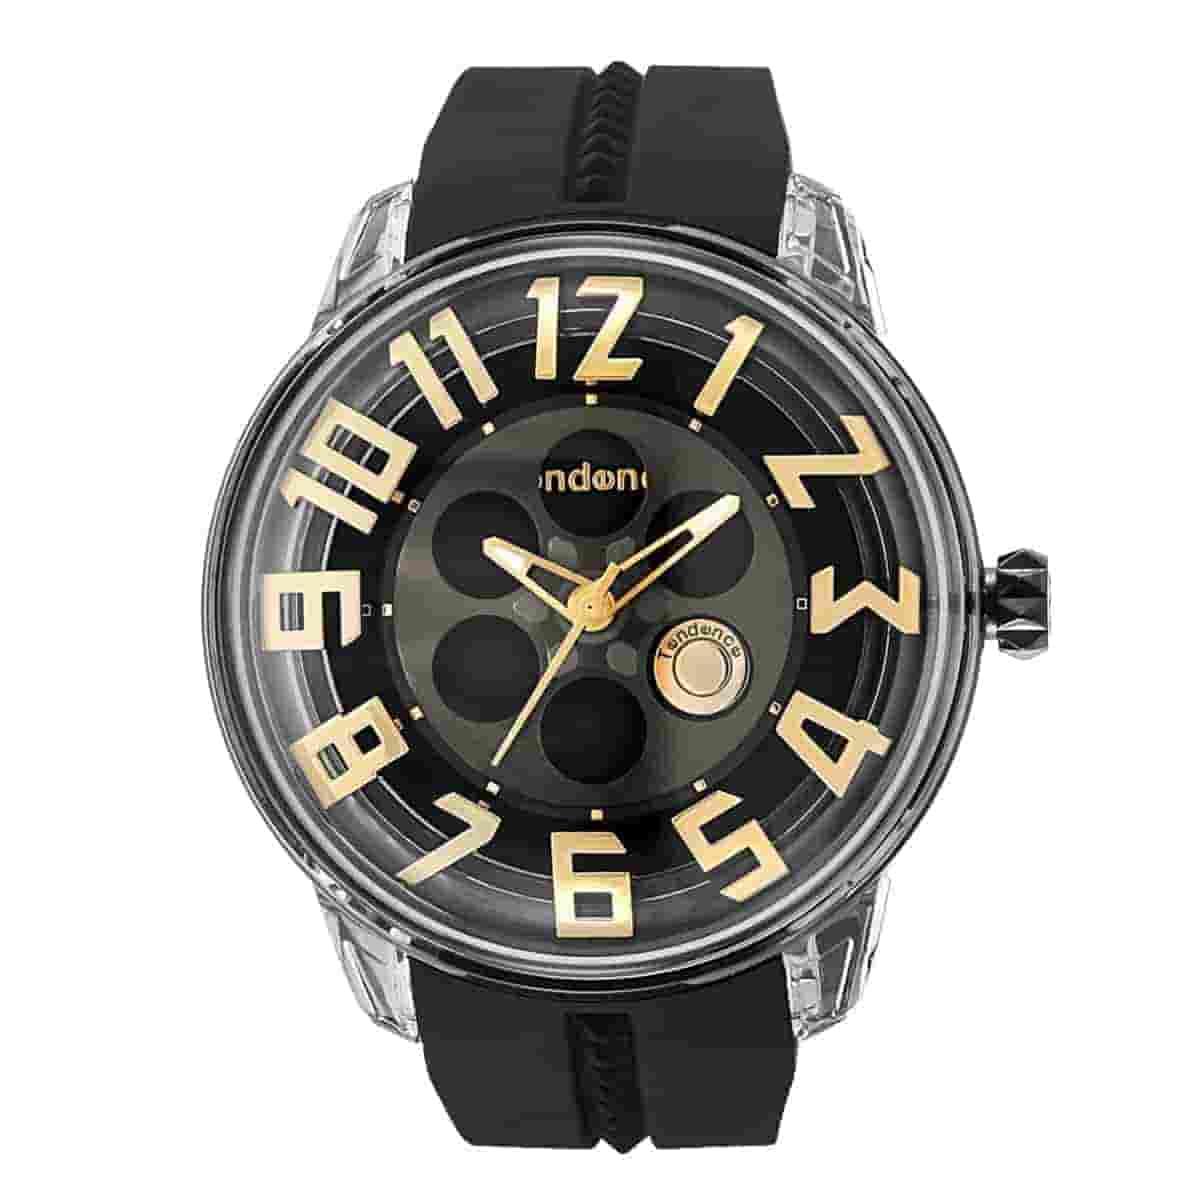 Tendence(テンデンス) King Dome(キングドーム) TY023002 腕時計